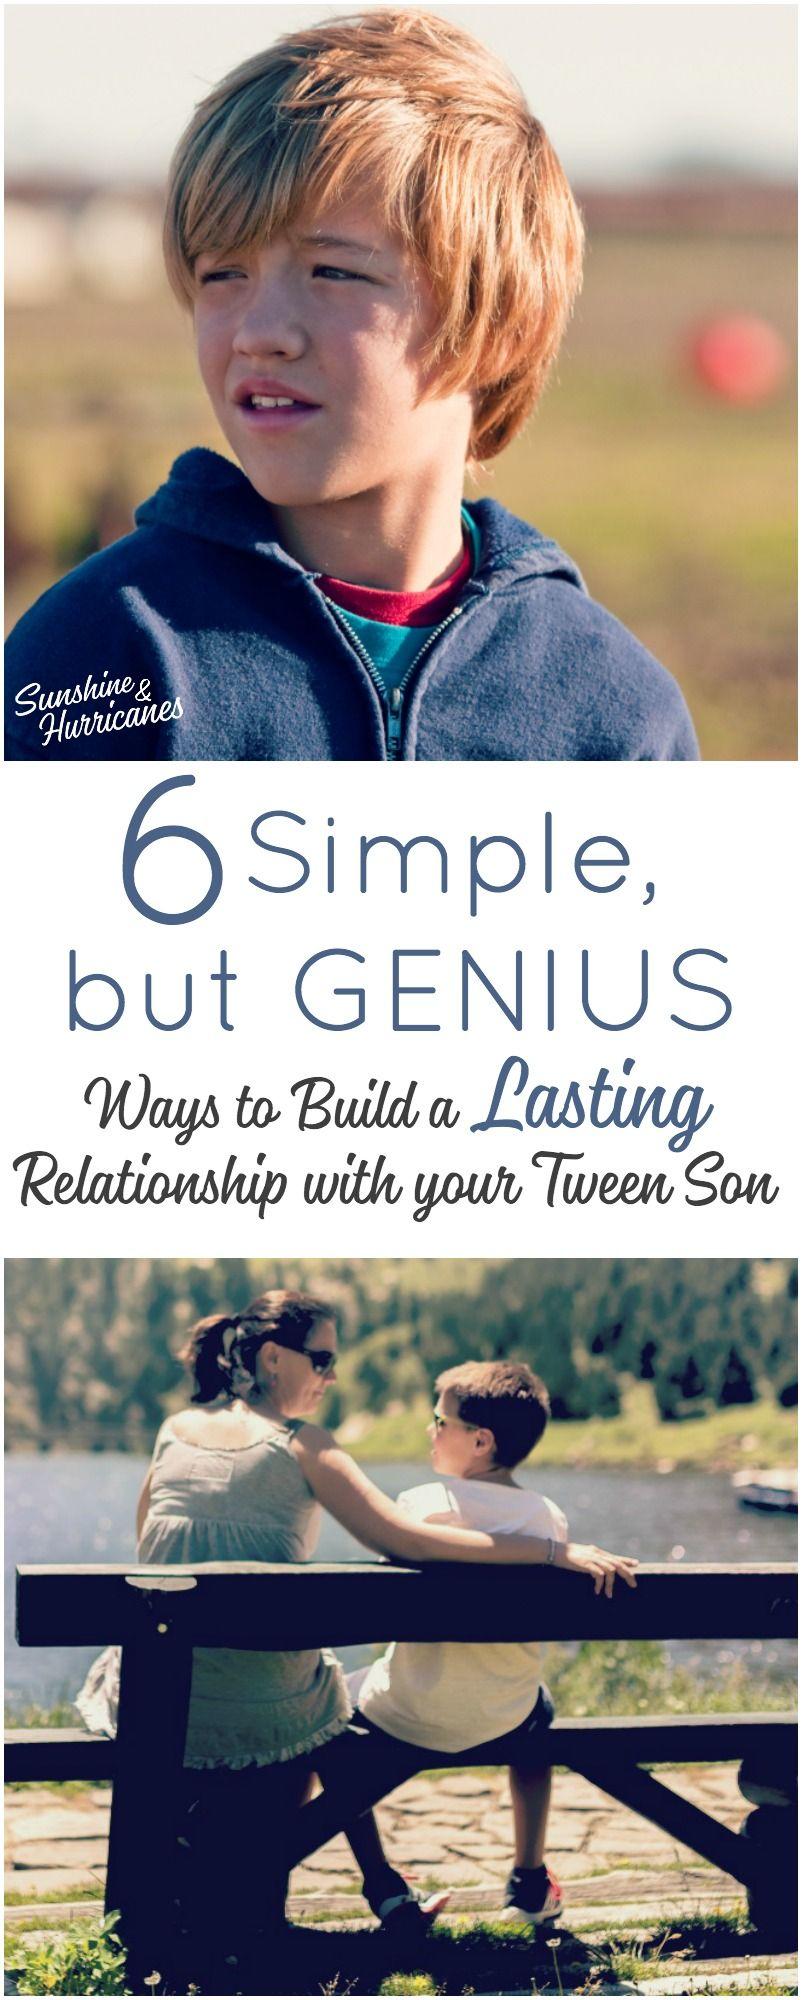 6 Genius Ways To Build a Lasting Relationship w/ Your Tween Son